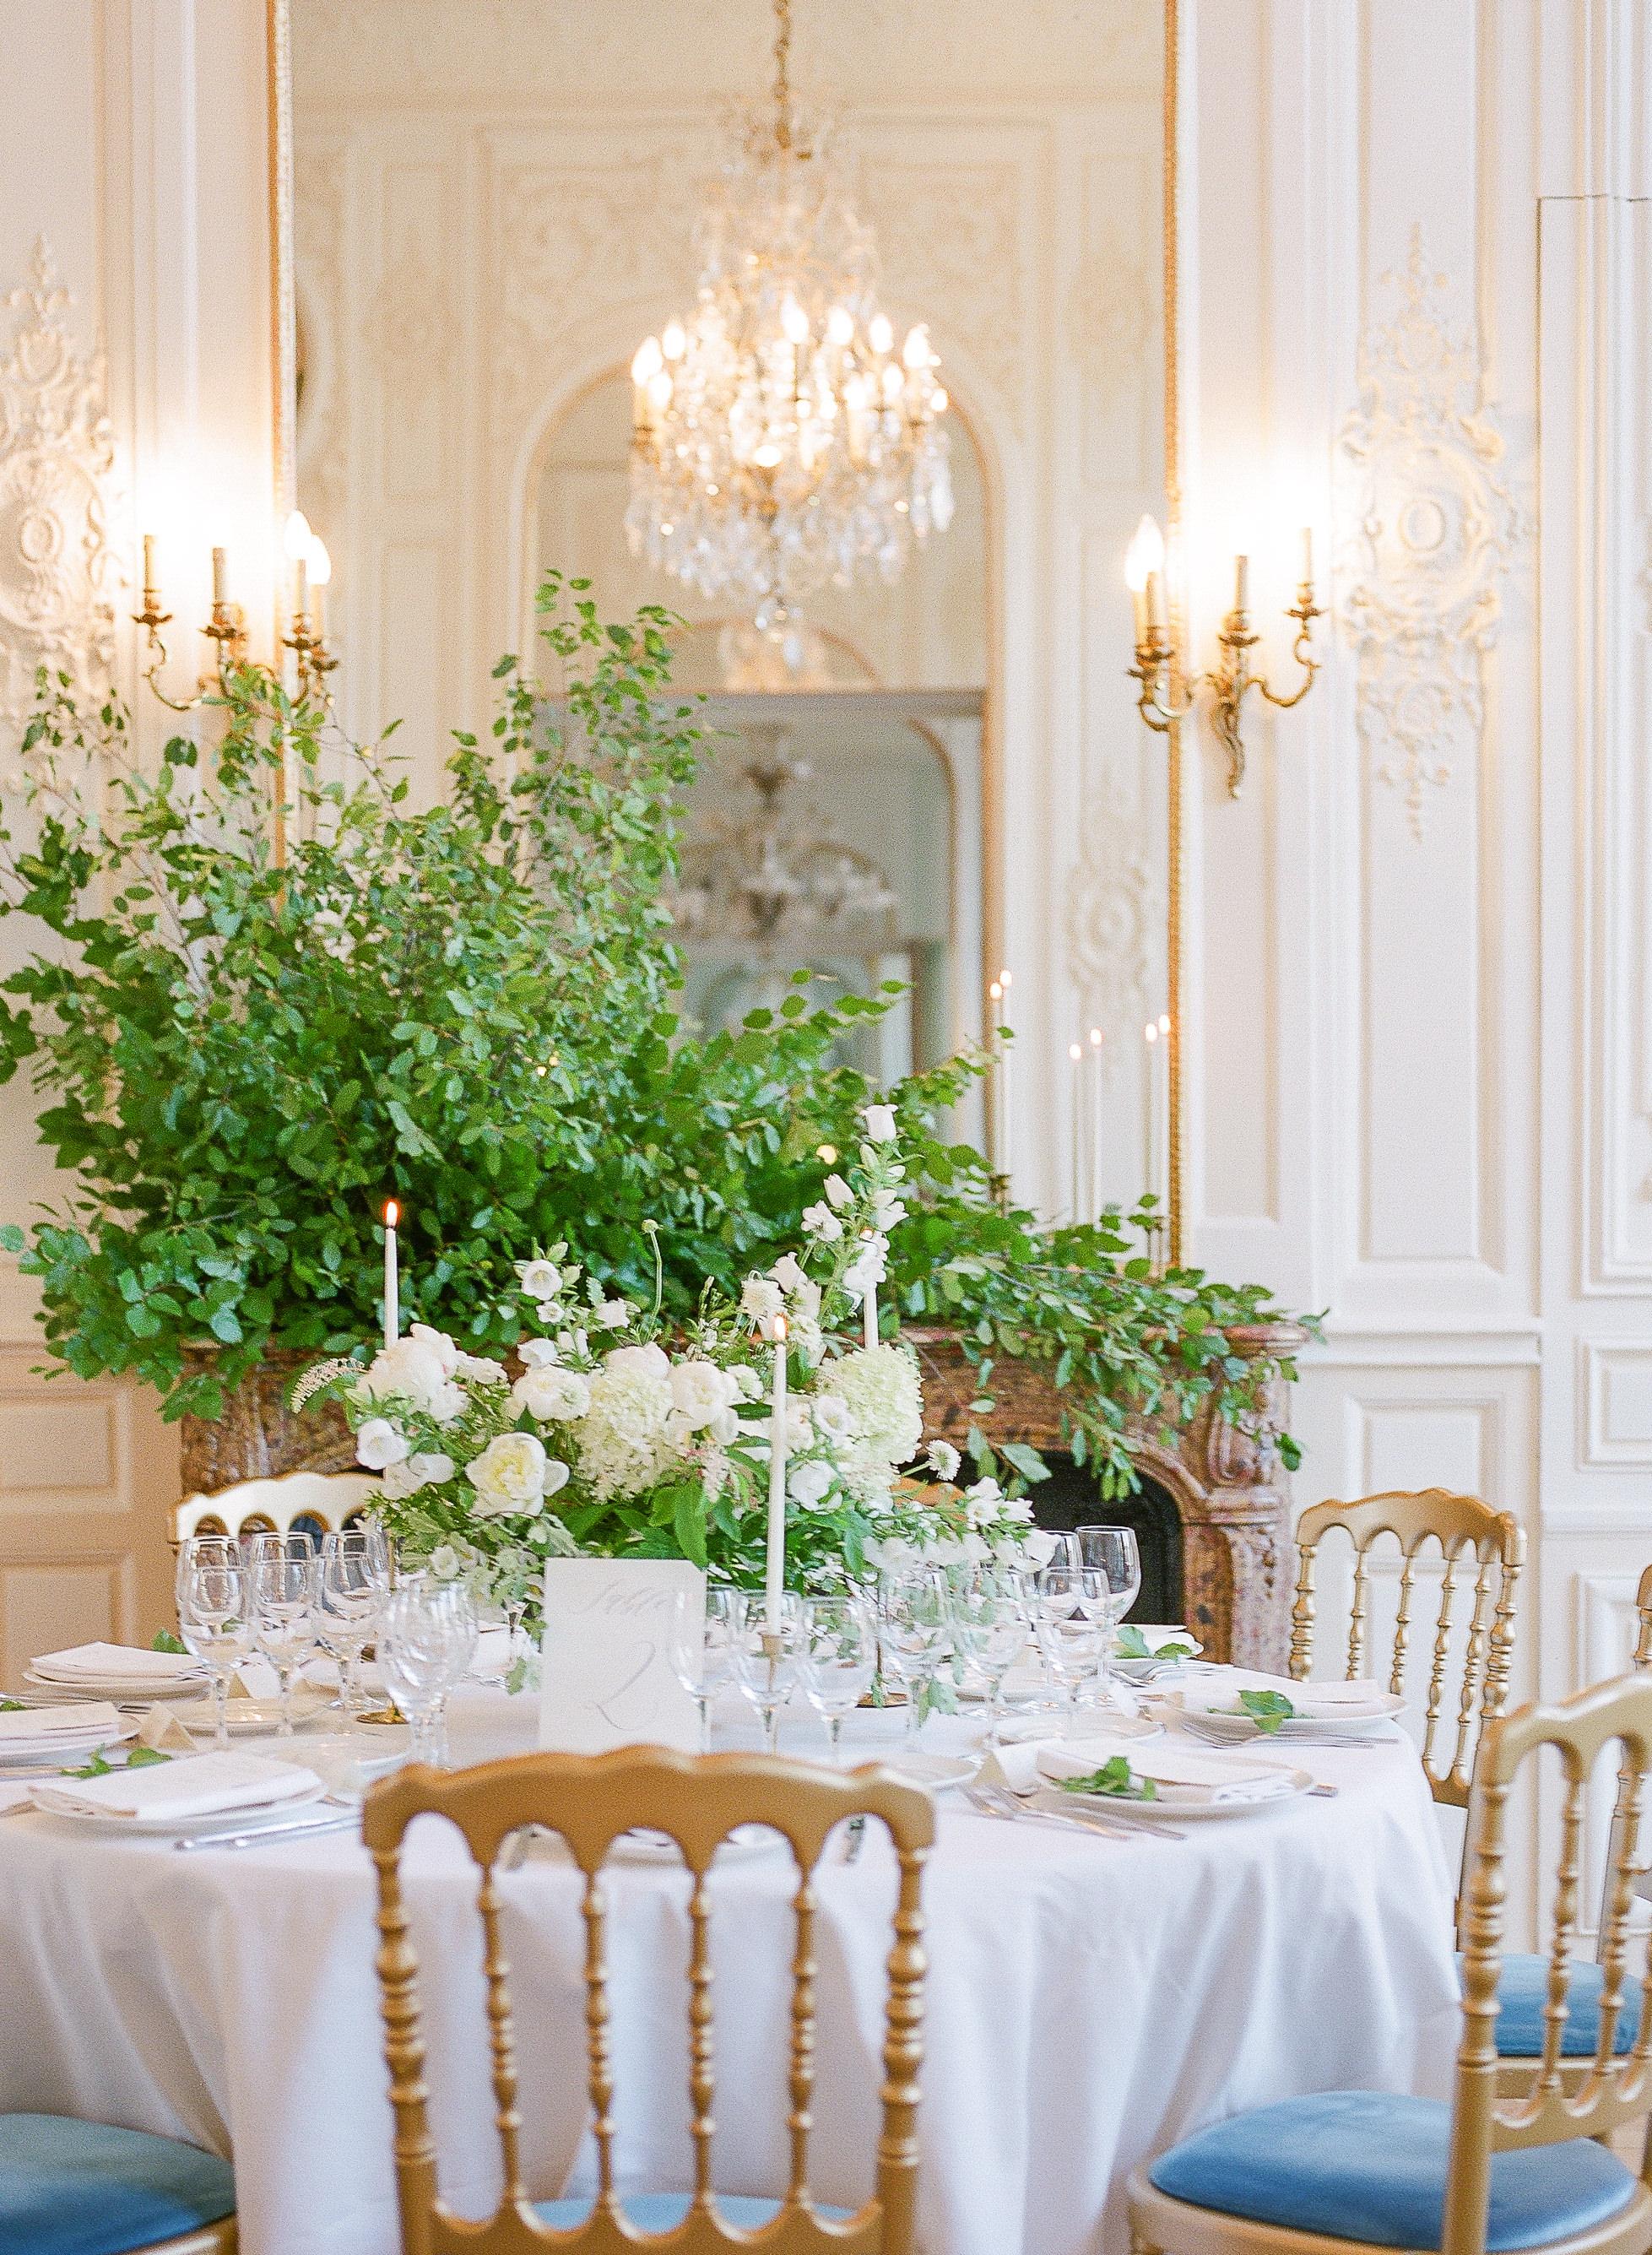 fine-art-french-wedding-florist-foraged-floral-paris-france-wedding-florist.jpg